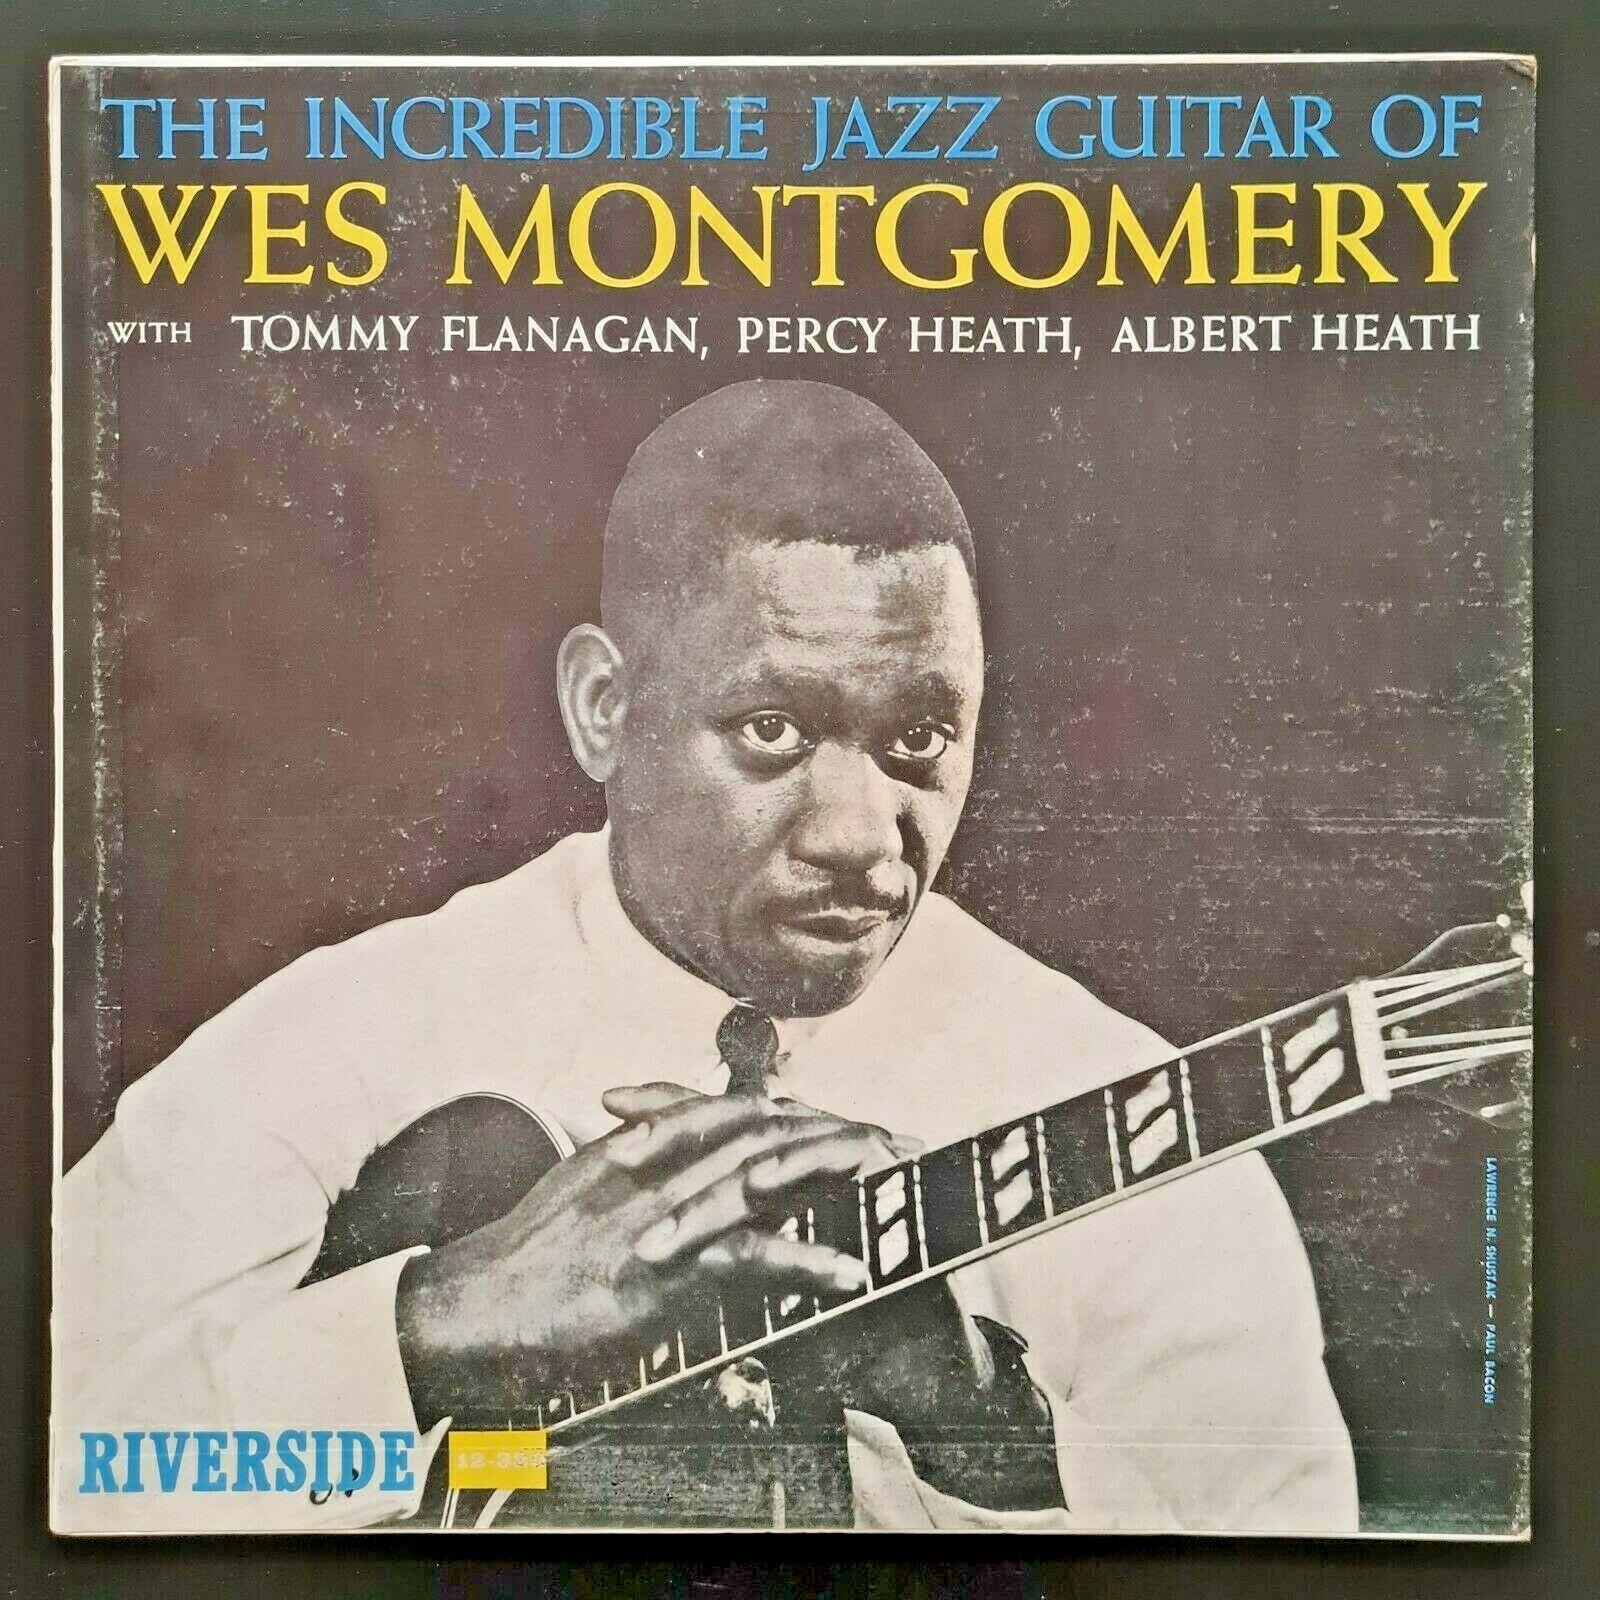 THE INCREDIBLE JAZZ GUITAR OF WES MONTGOMERY LP orig 1st 1960 RIVERSIDE DG PROMO